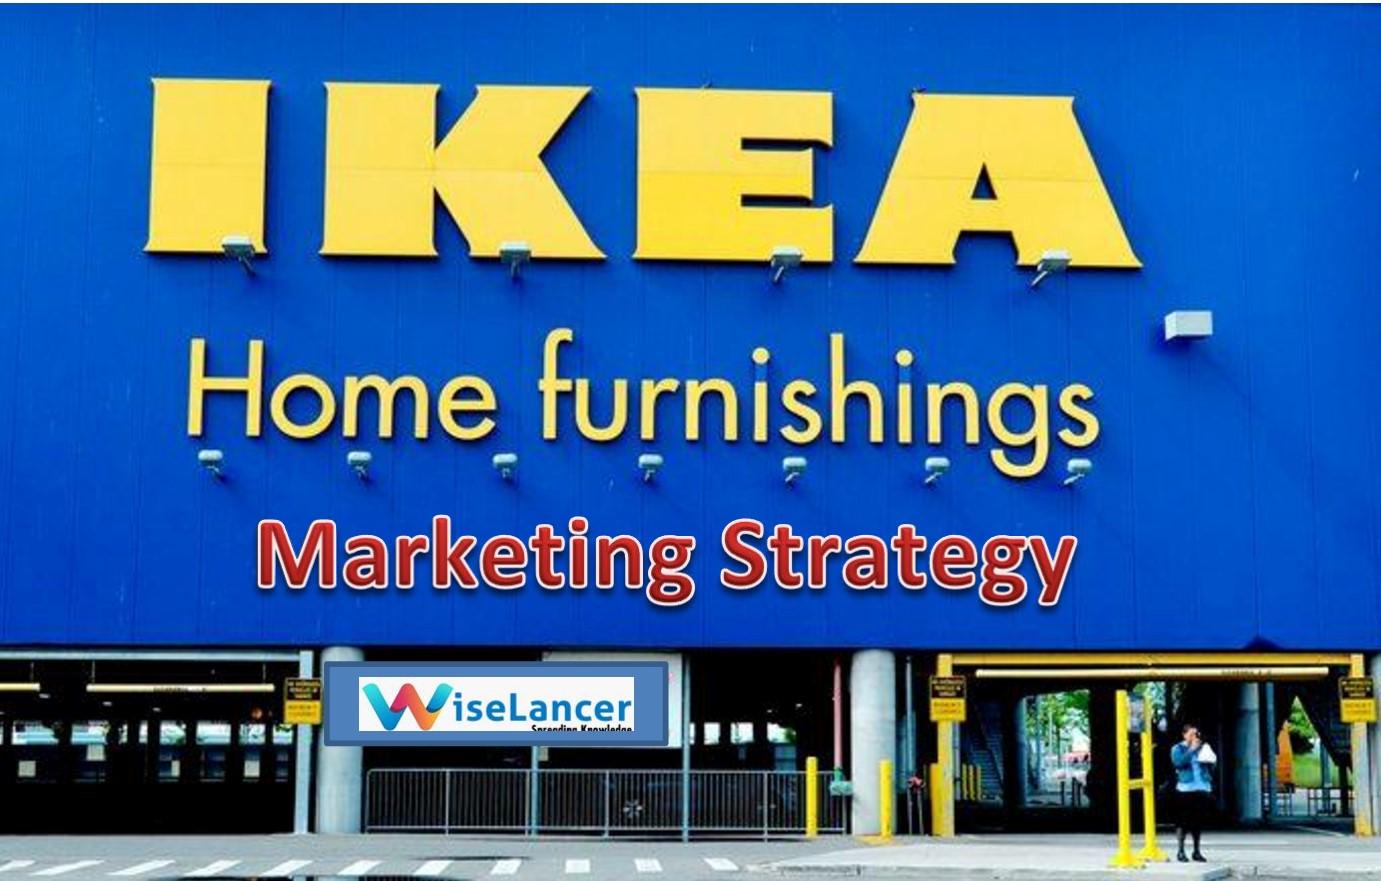 Marketing Strategy of IKEA